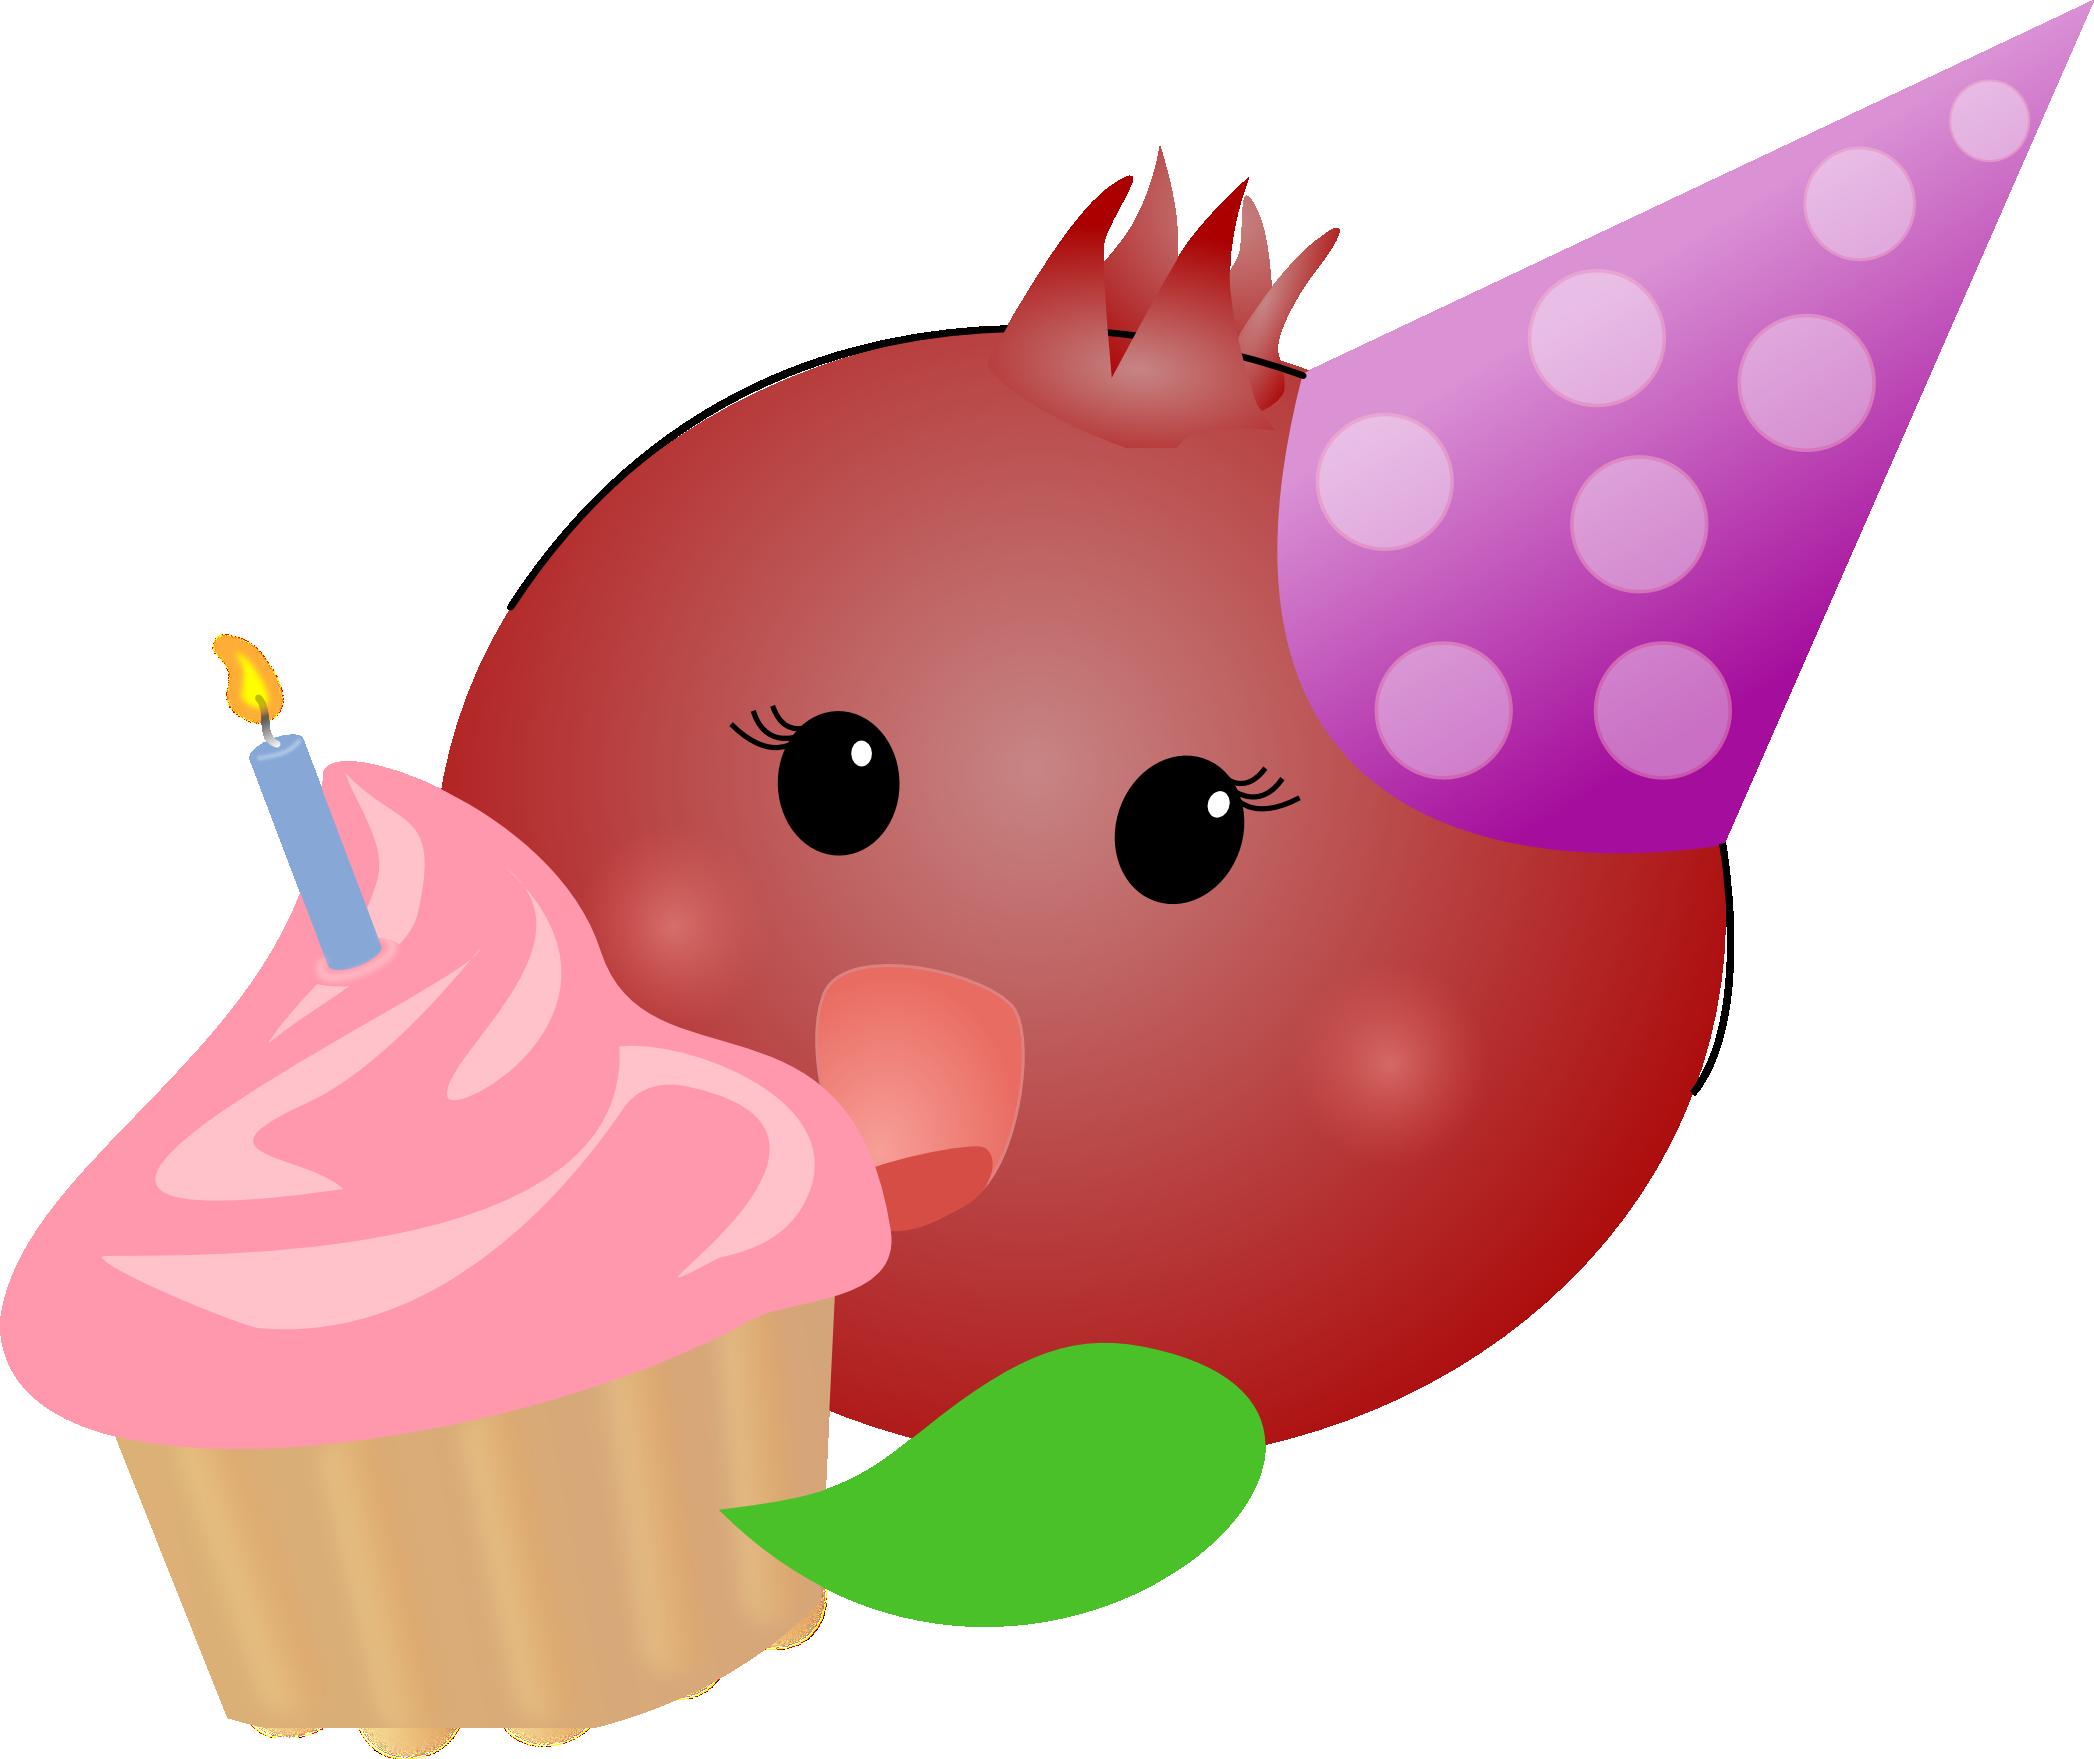 Pomegranate clipart illustration. Birthday the pretty pommie